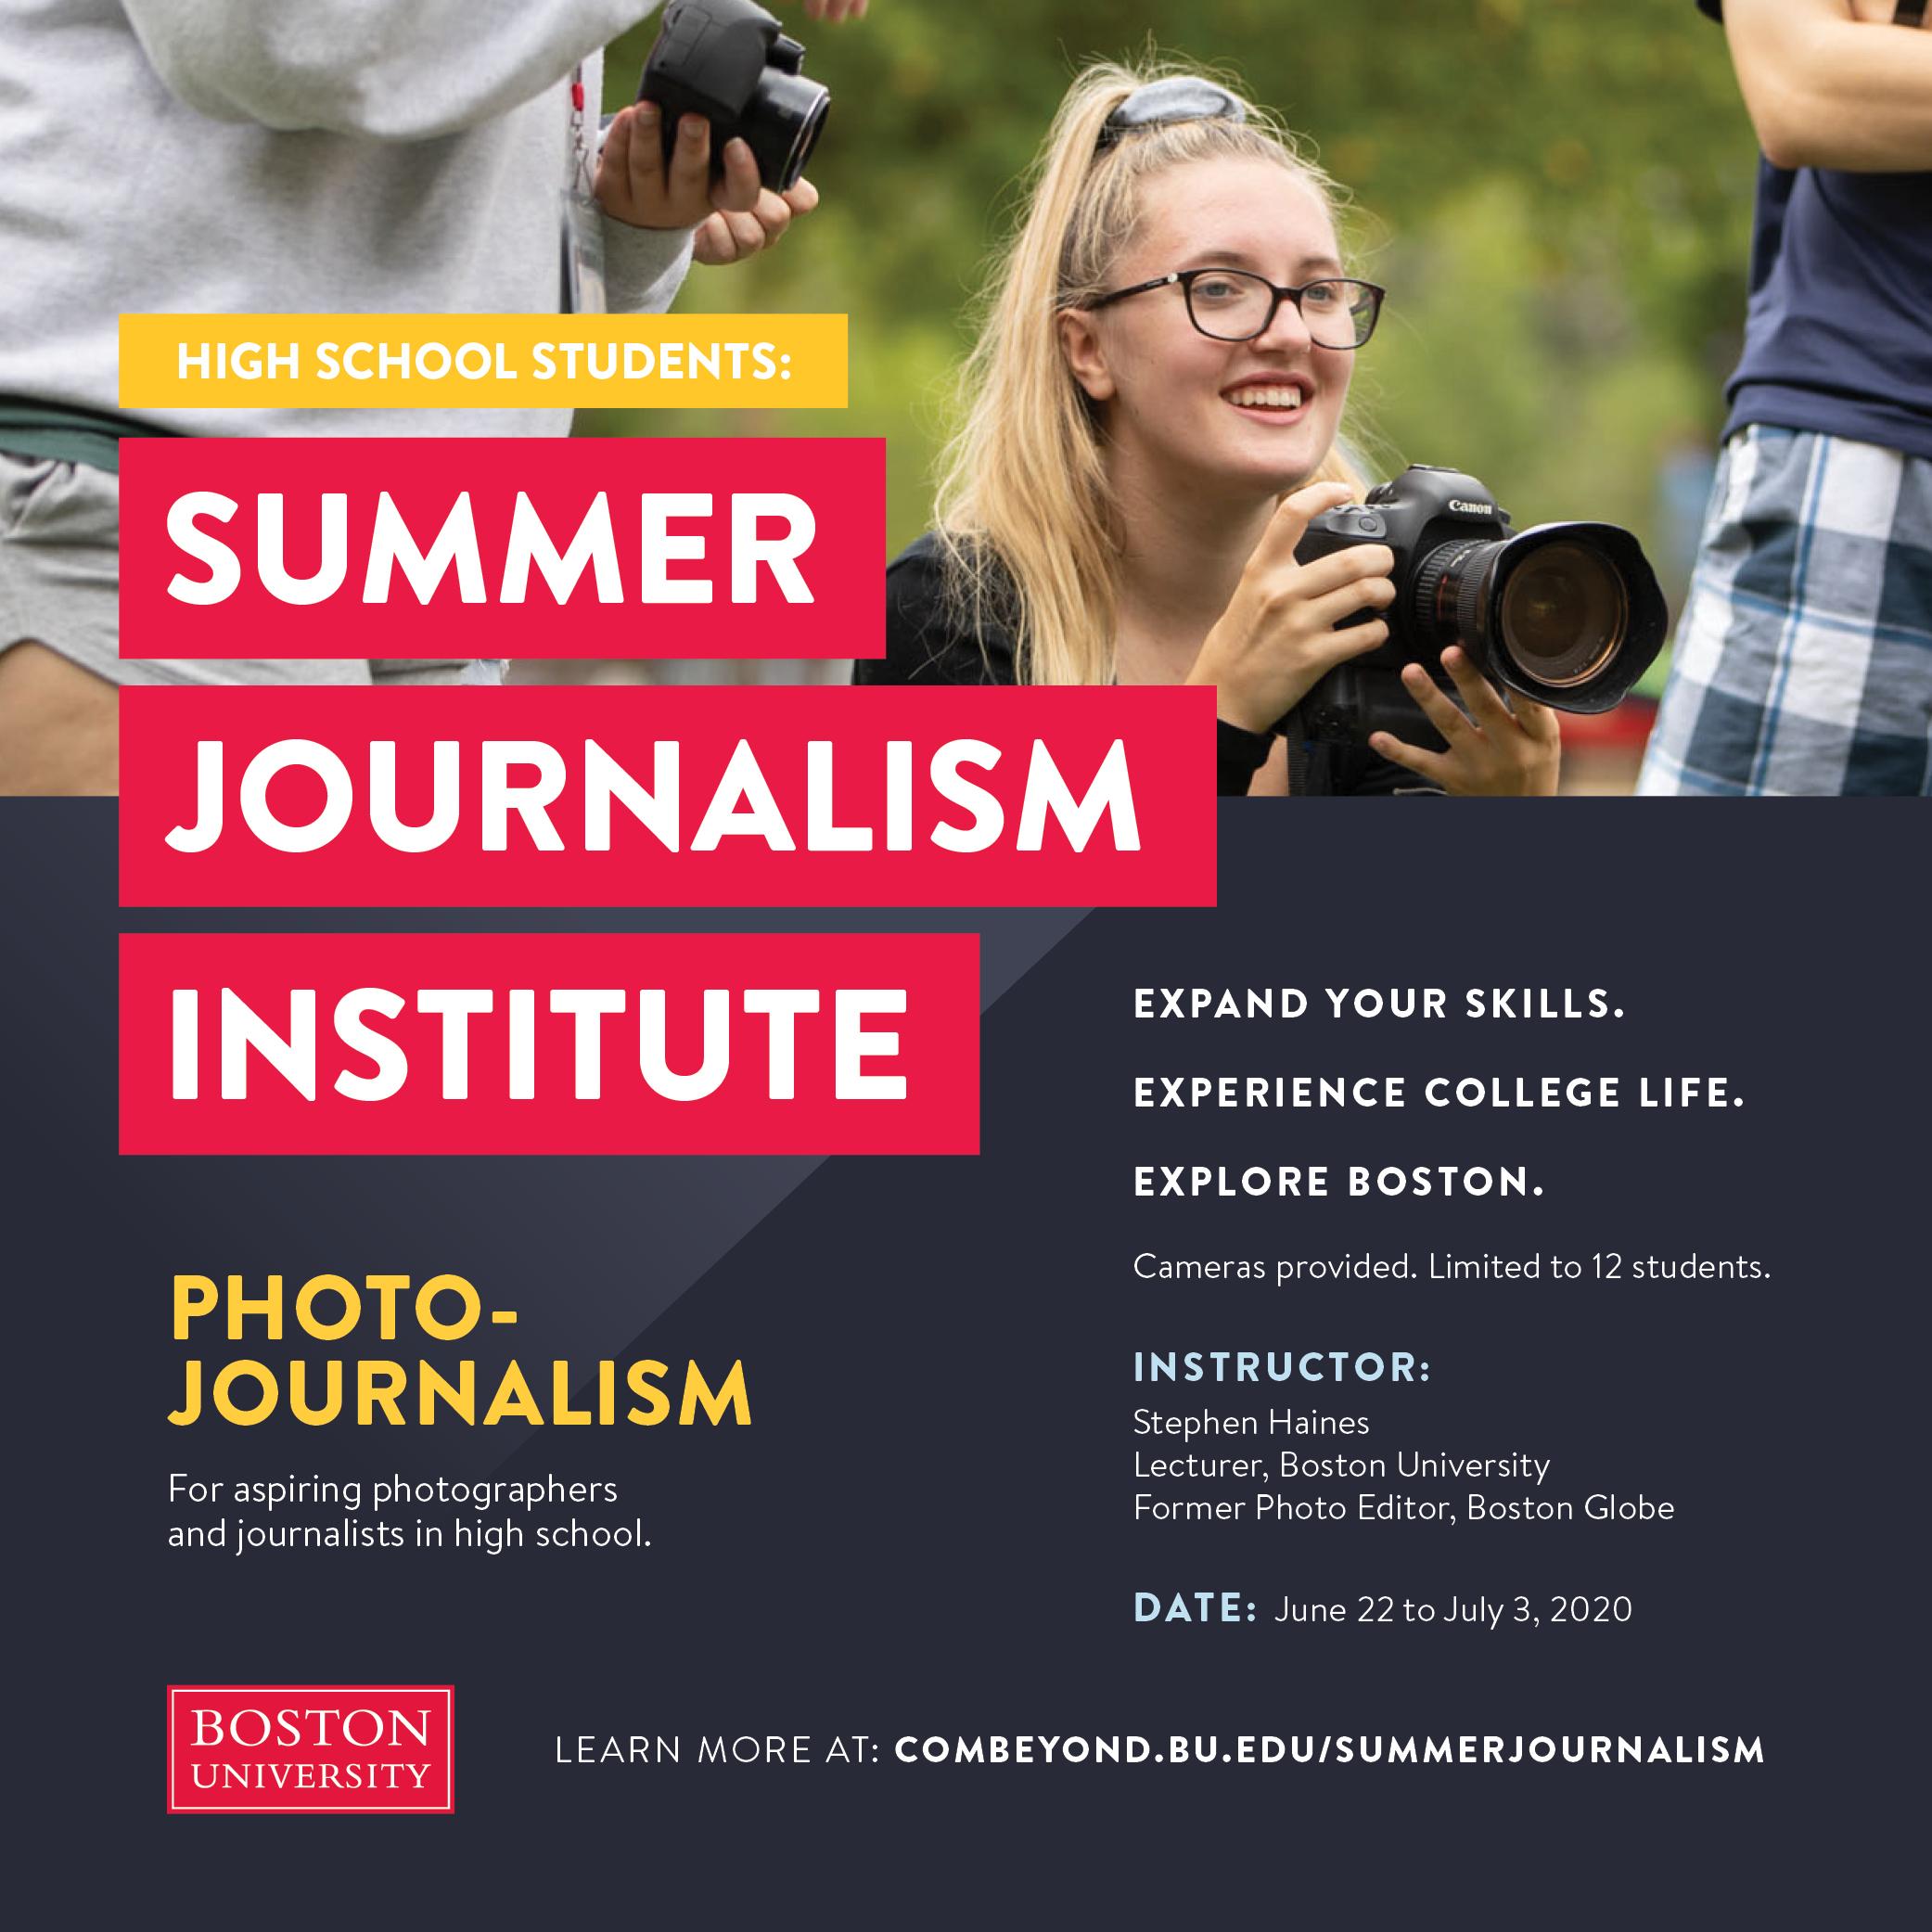 Summer Journalism Programs High School Students